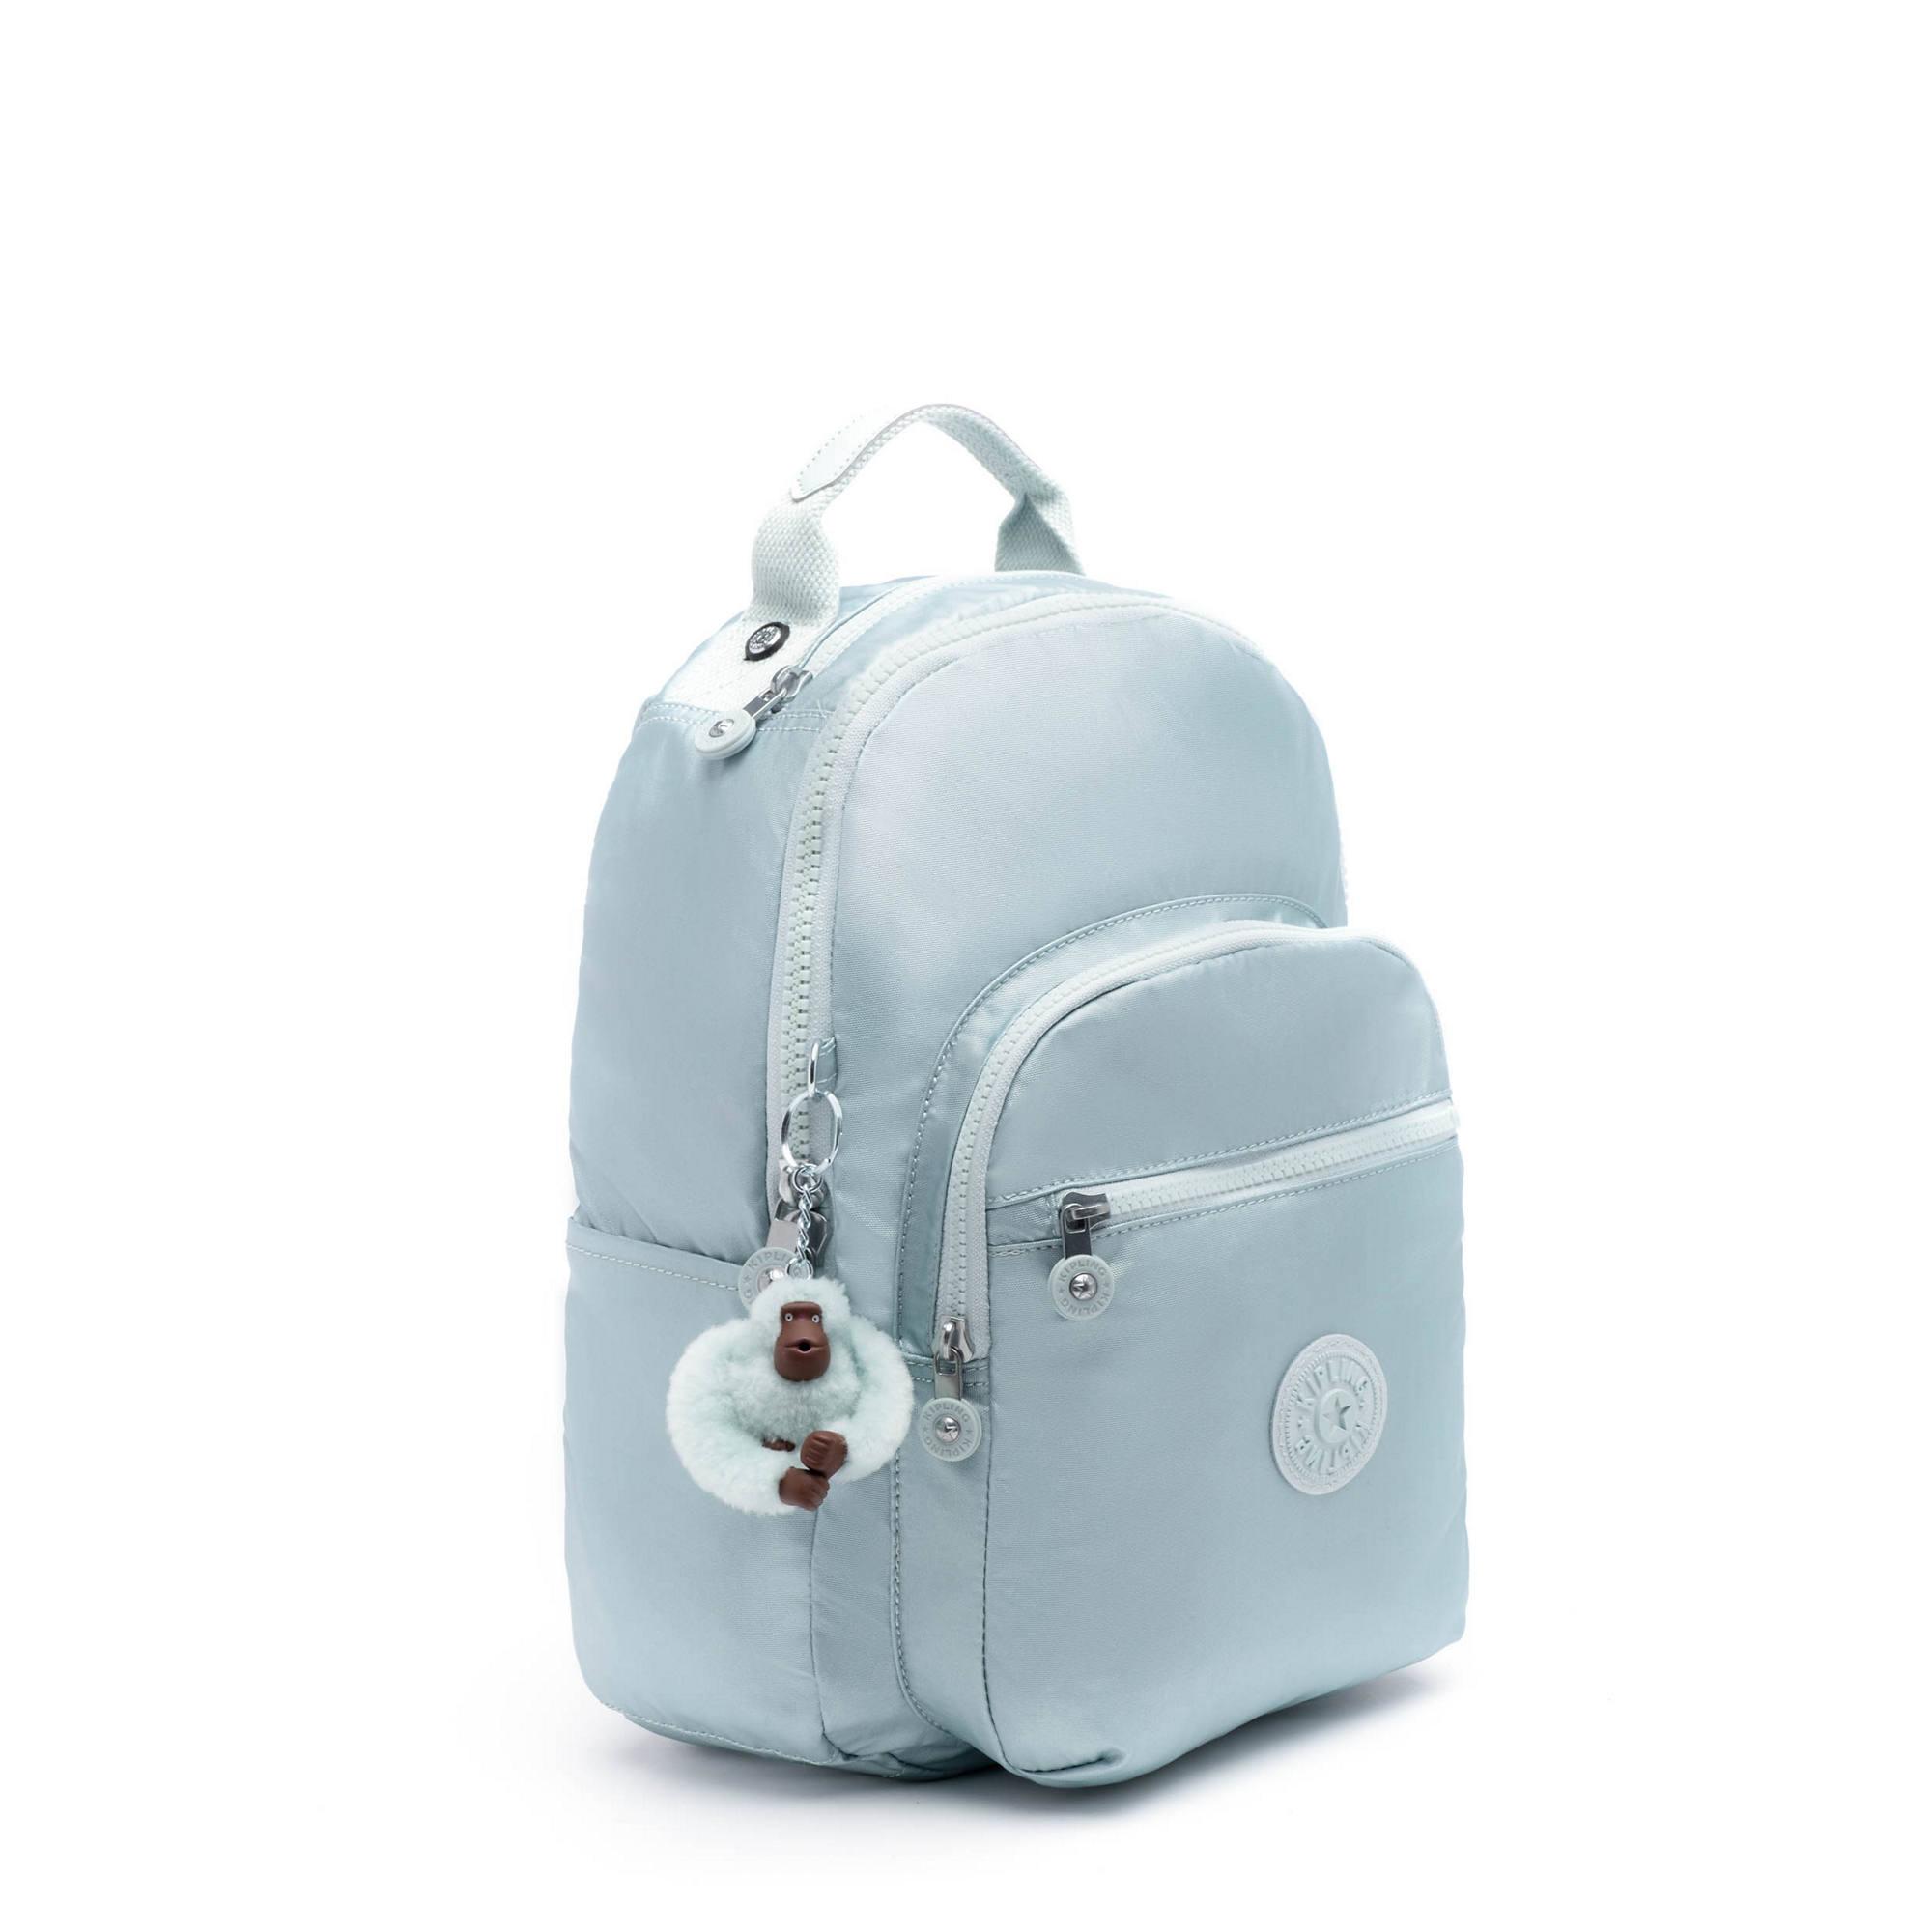 Kipling-Seoul-Small-11-034-Laptop-Backpack thumbnail 8